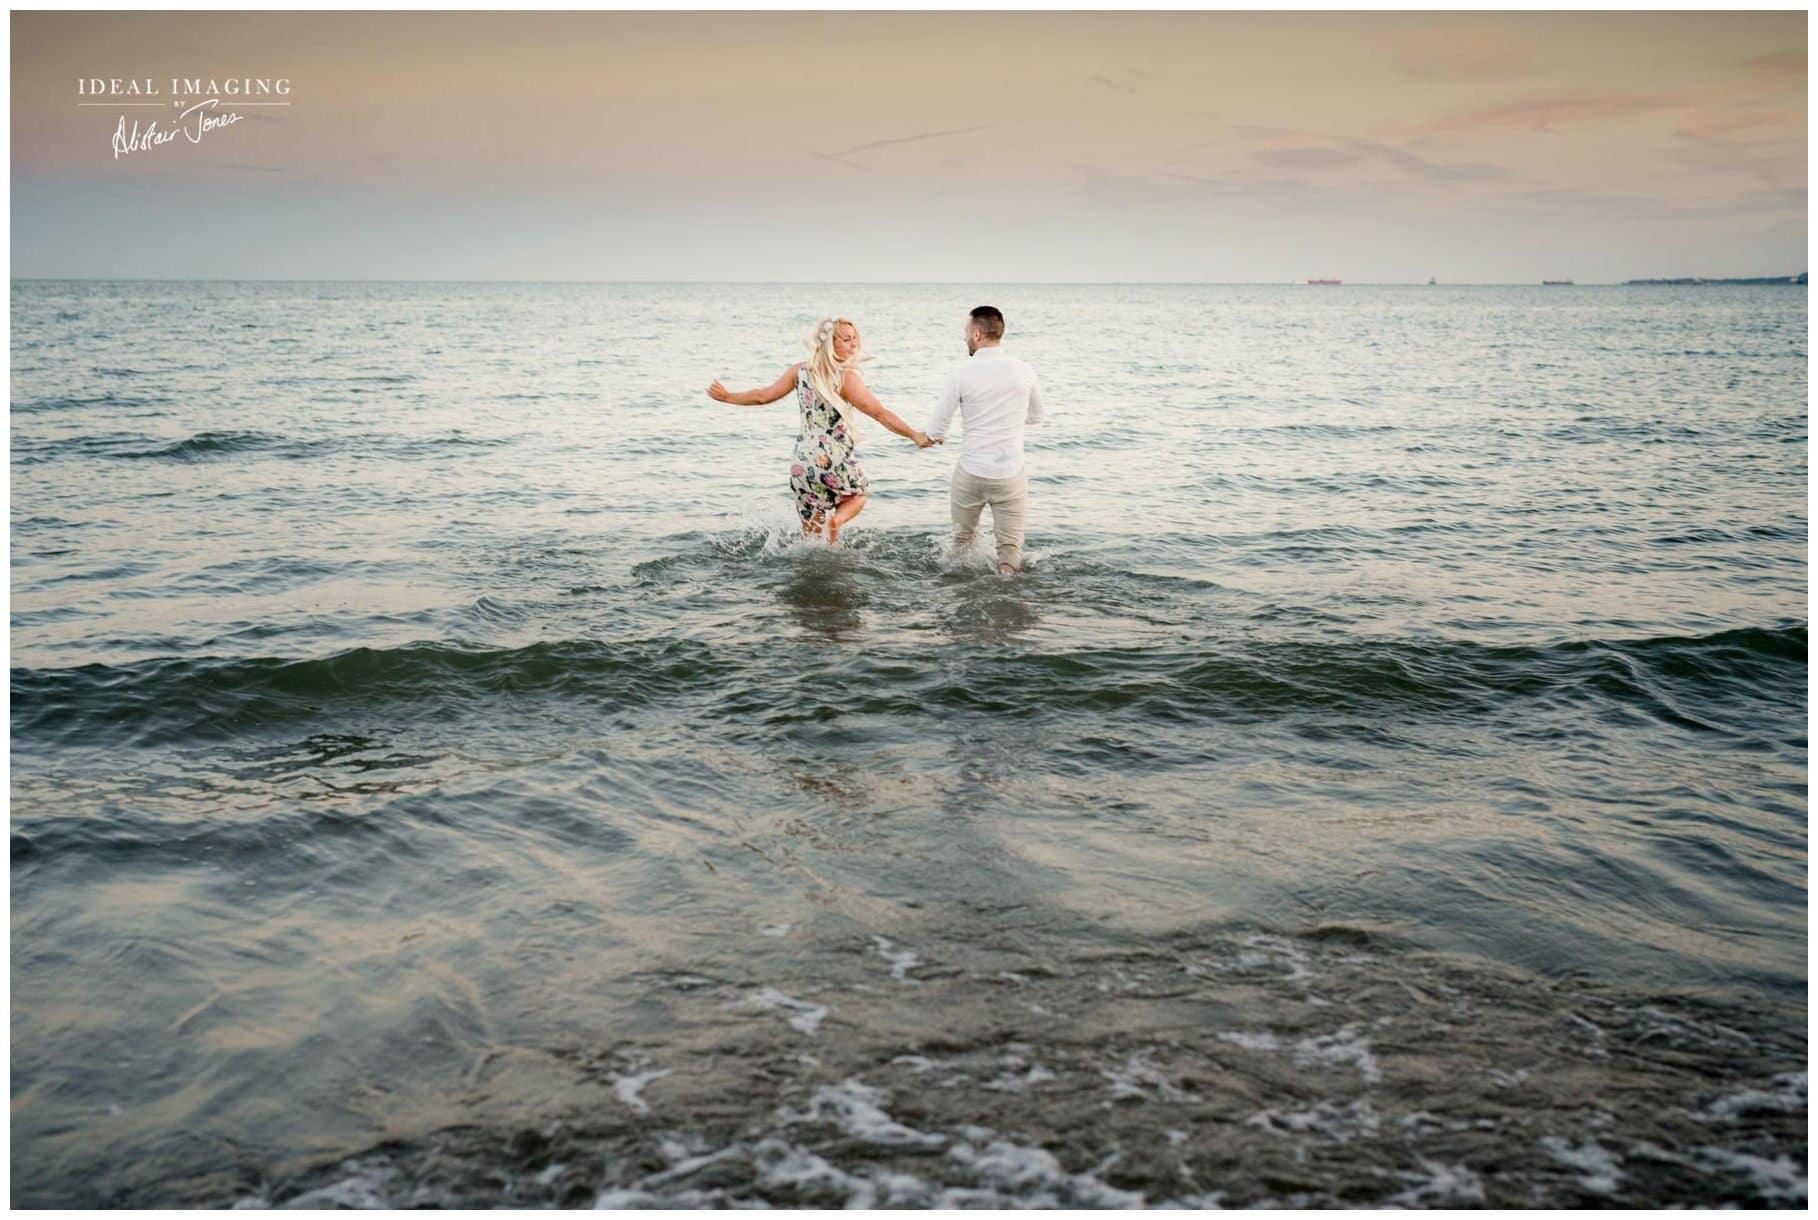 beach_engagement_photoshoot_hayling_island-058